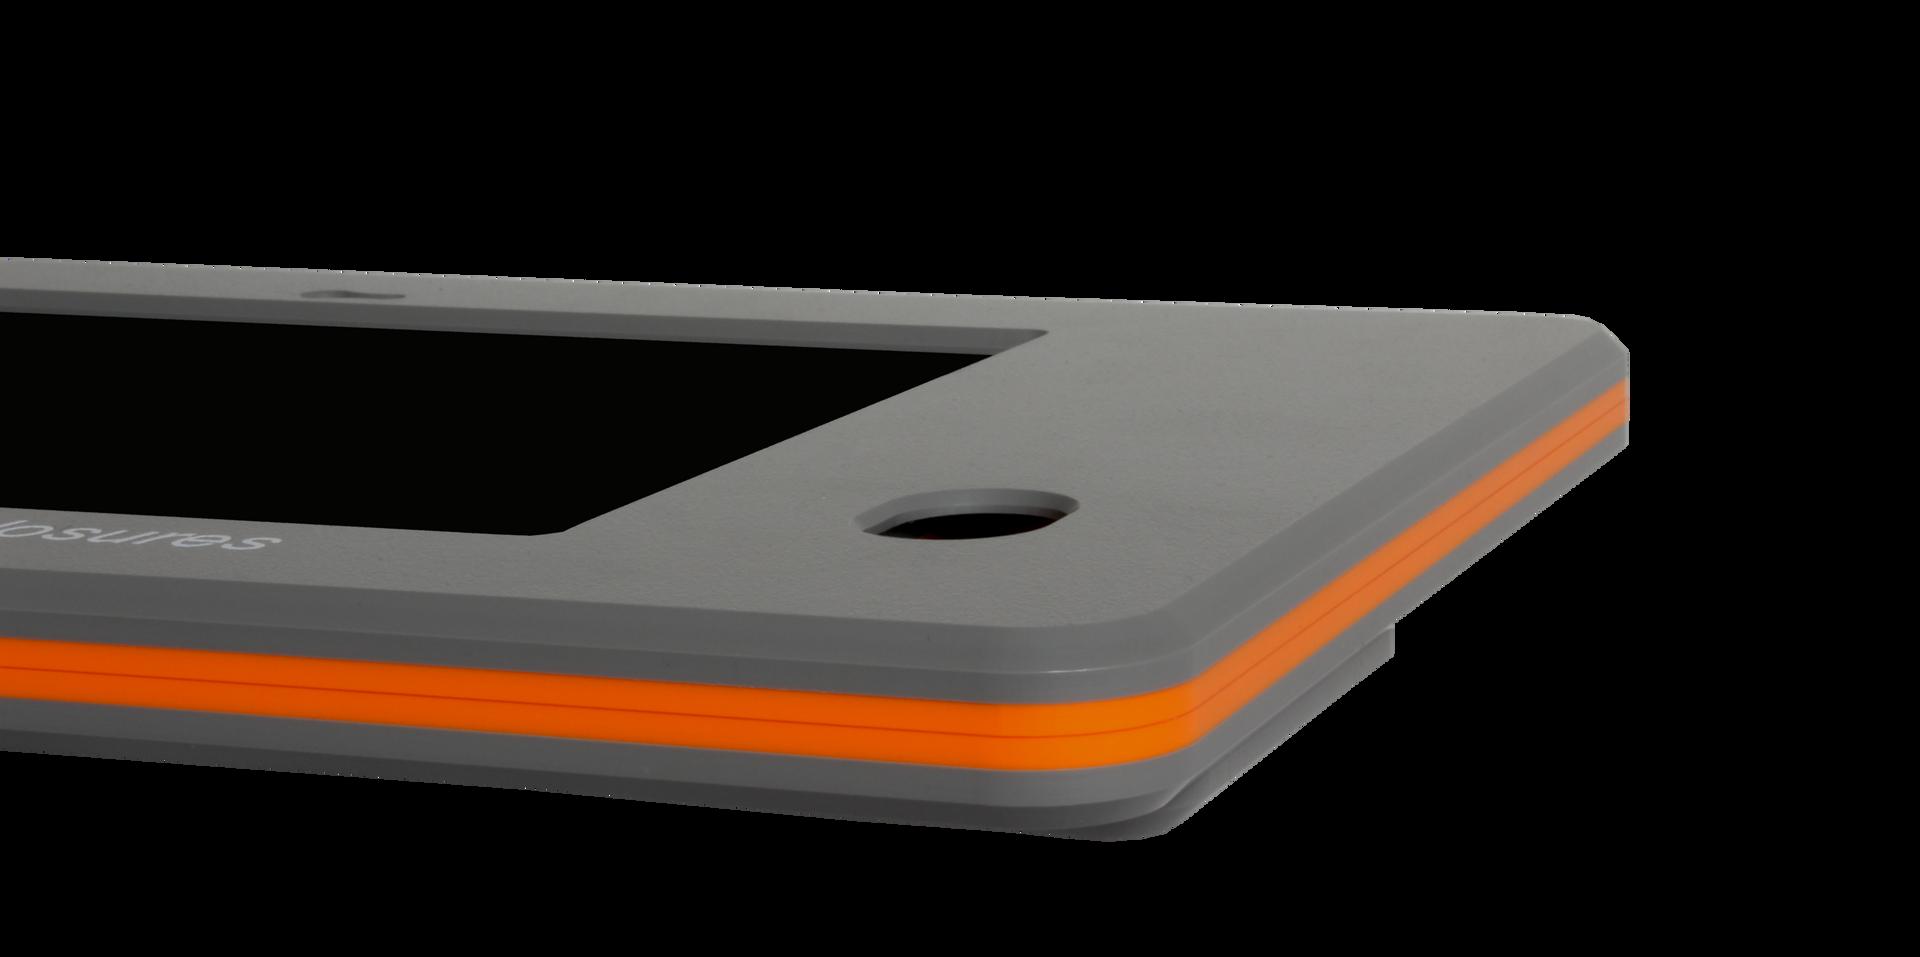 Fabricated plastic tablet enclosure